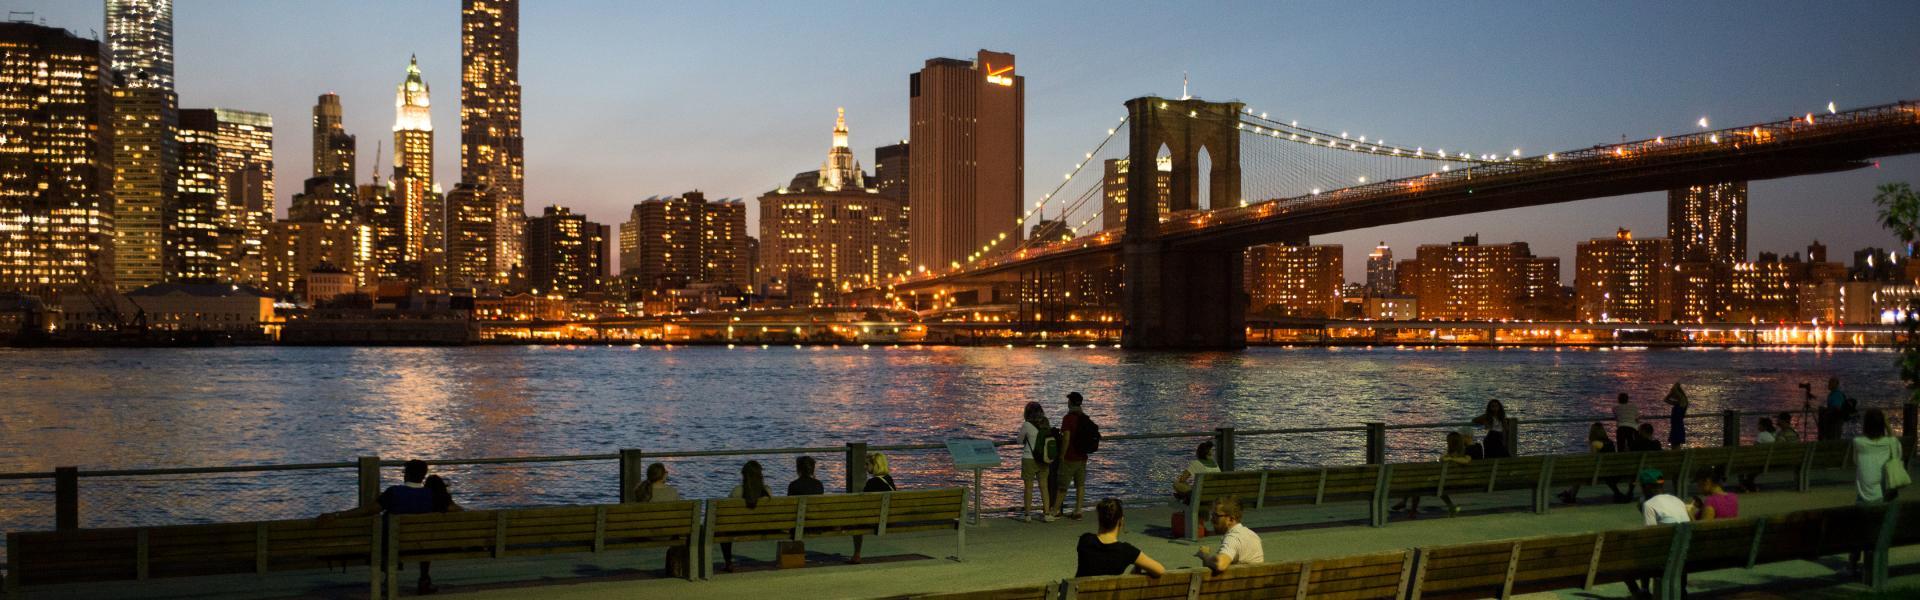 Brooklyn Bridge Park, Skyline, Evening